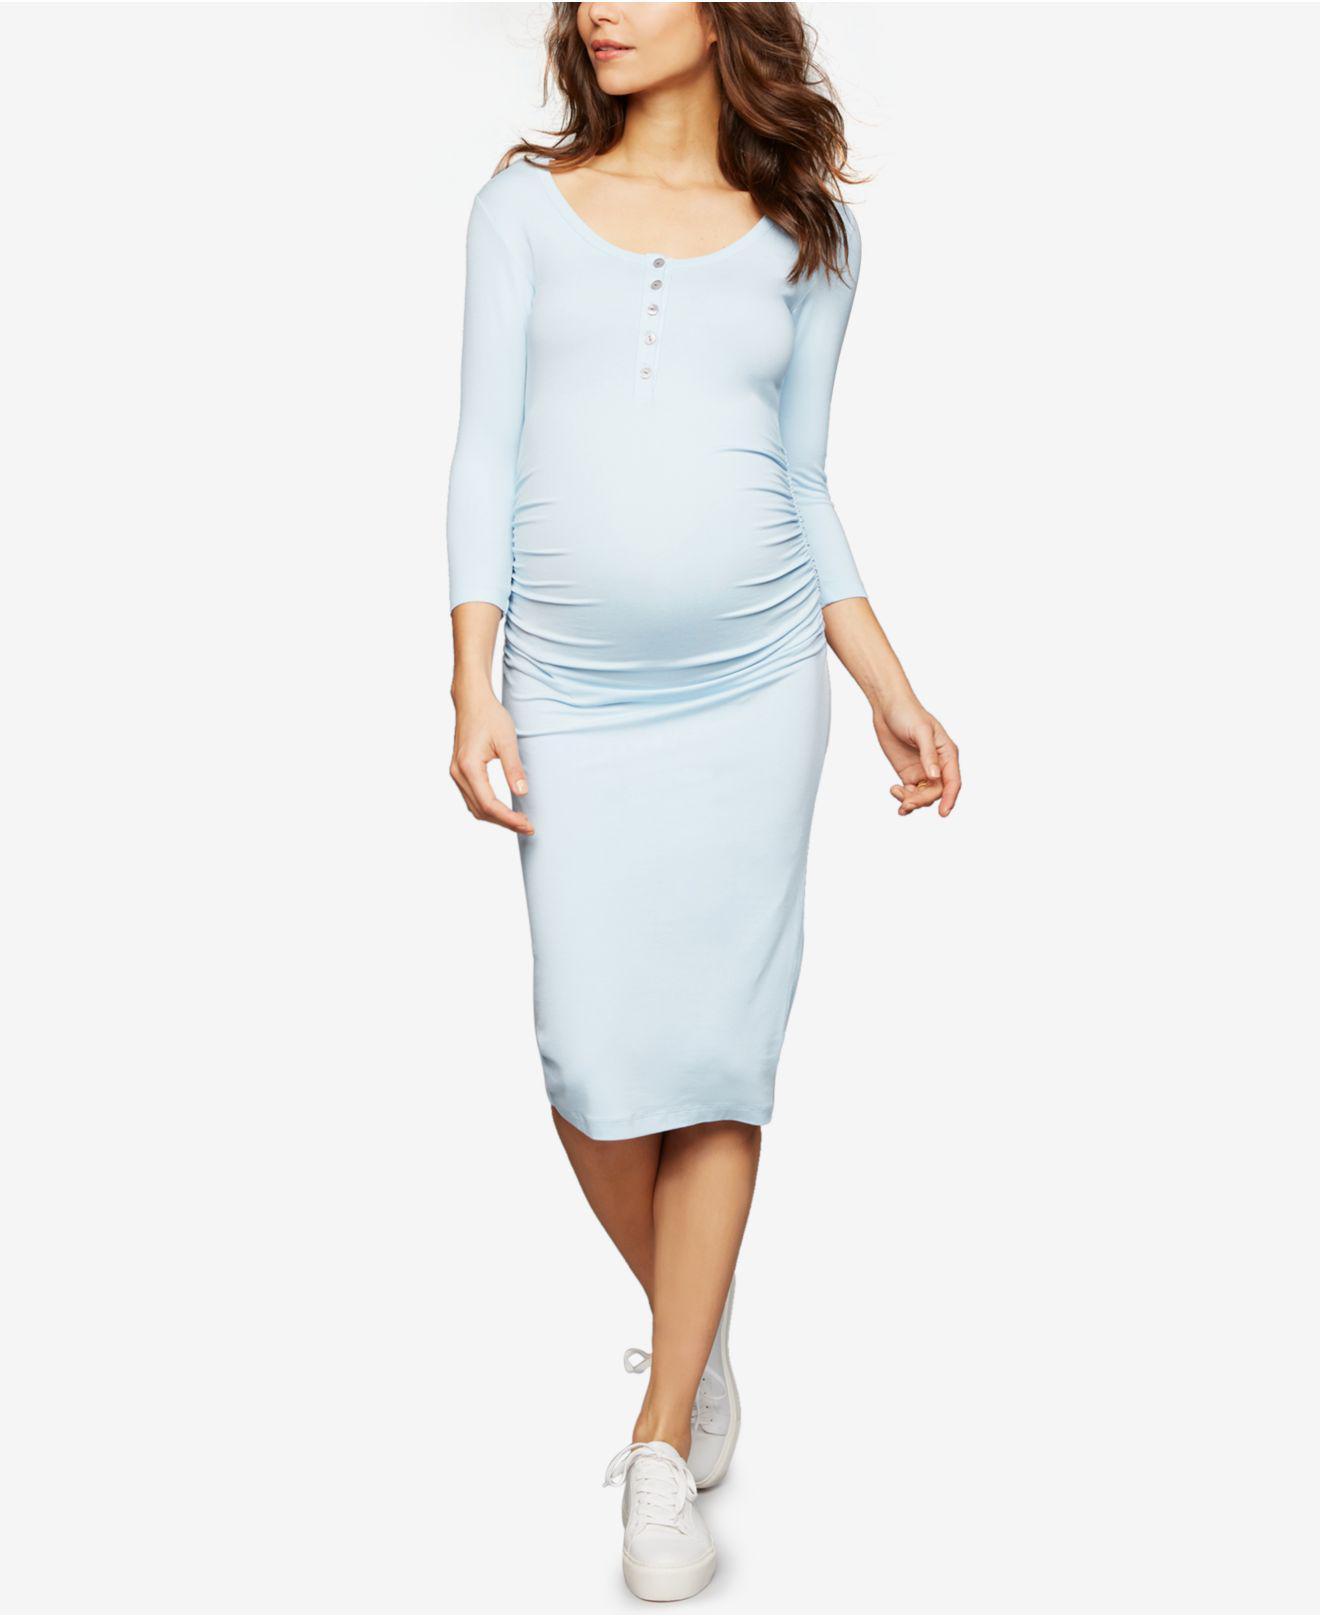 649272c265b55 Isabella Oliver Maternity Henley Sheath Dress in Blue - Save 20% - Lyst